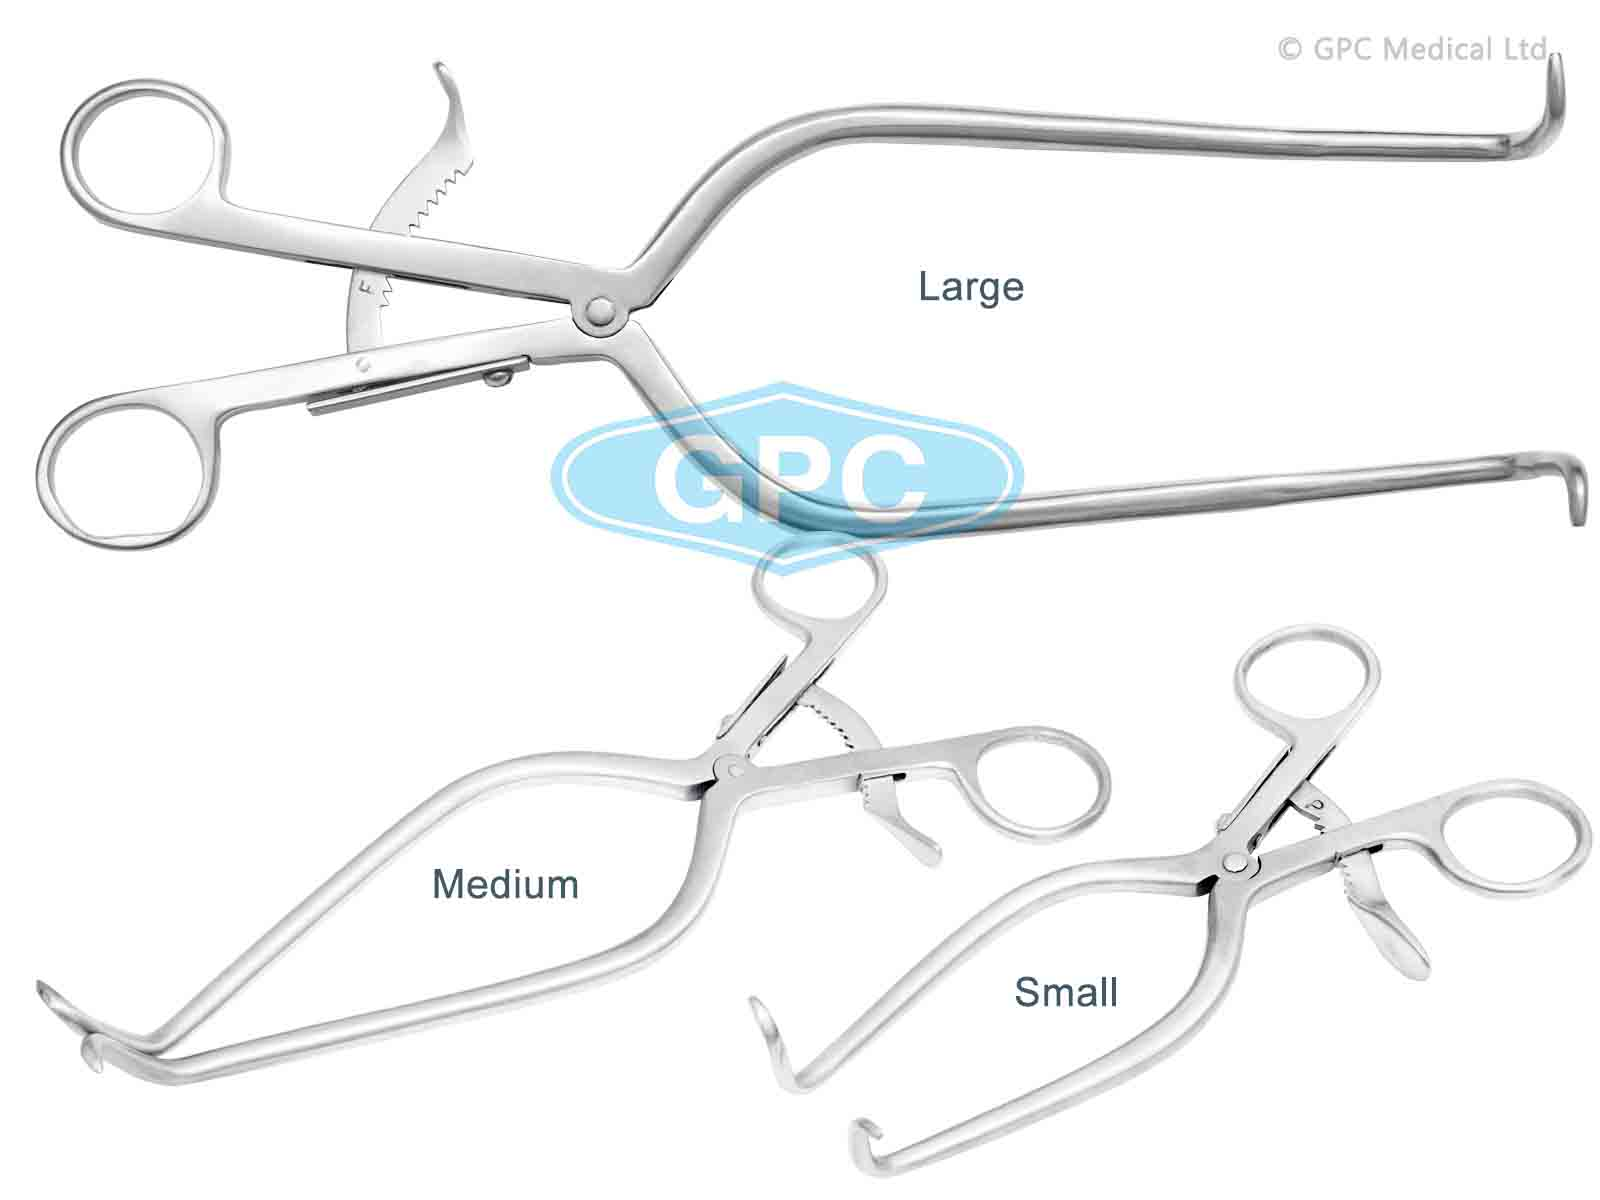 Gelpi Retractor-Small, Medium, Large